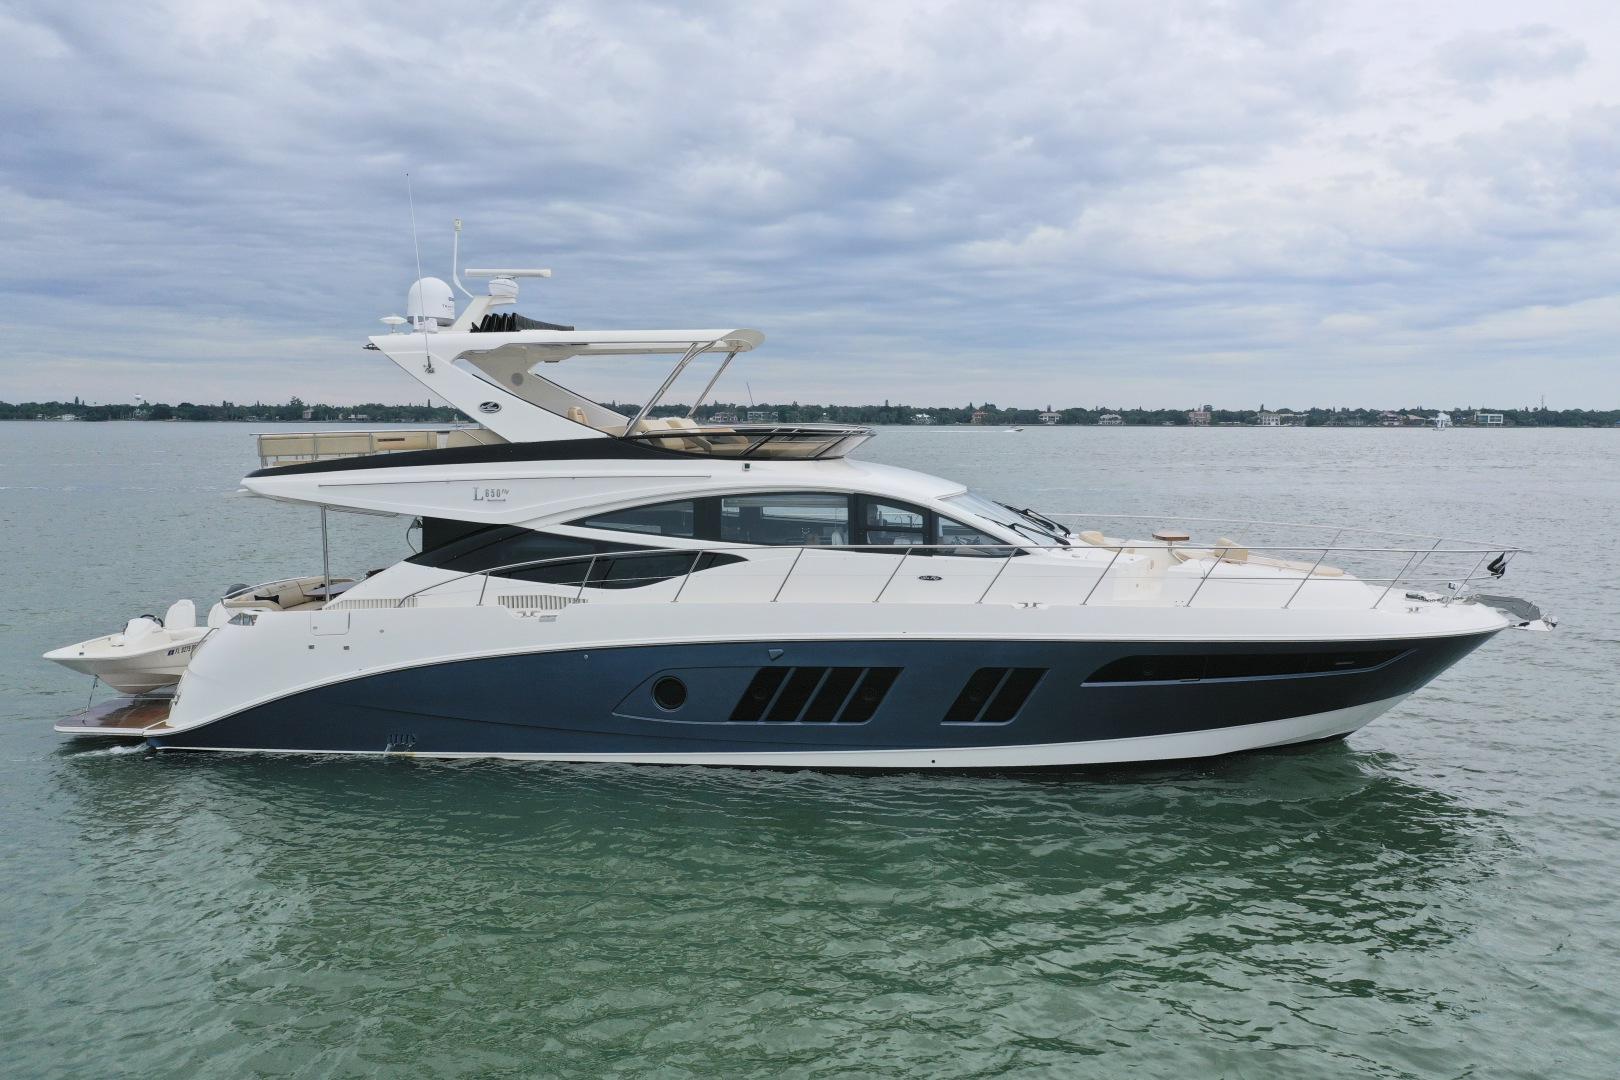 Sea Ray-L650 2016-3x's the Charm Longboat Key-Florida-United States-2016 Sea Ray L650 -1251881 | Thumbnail